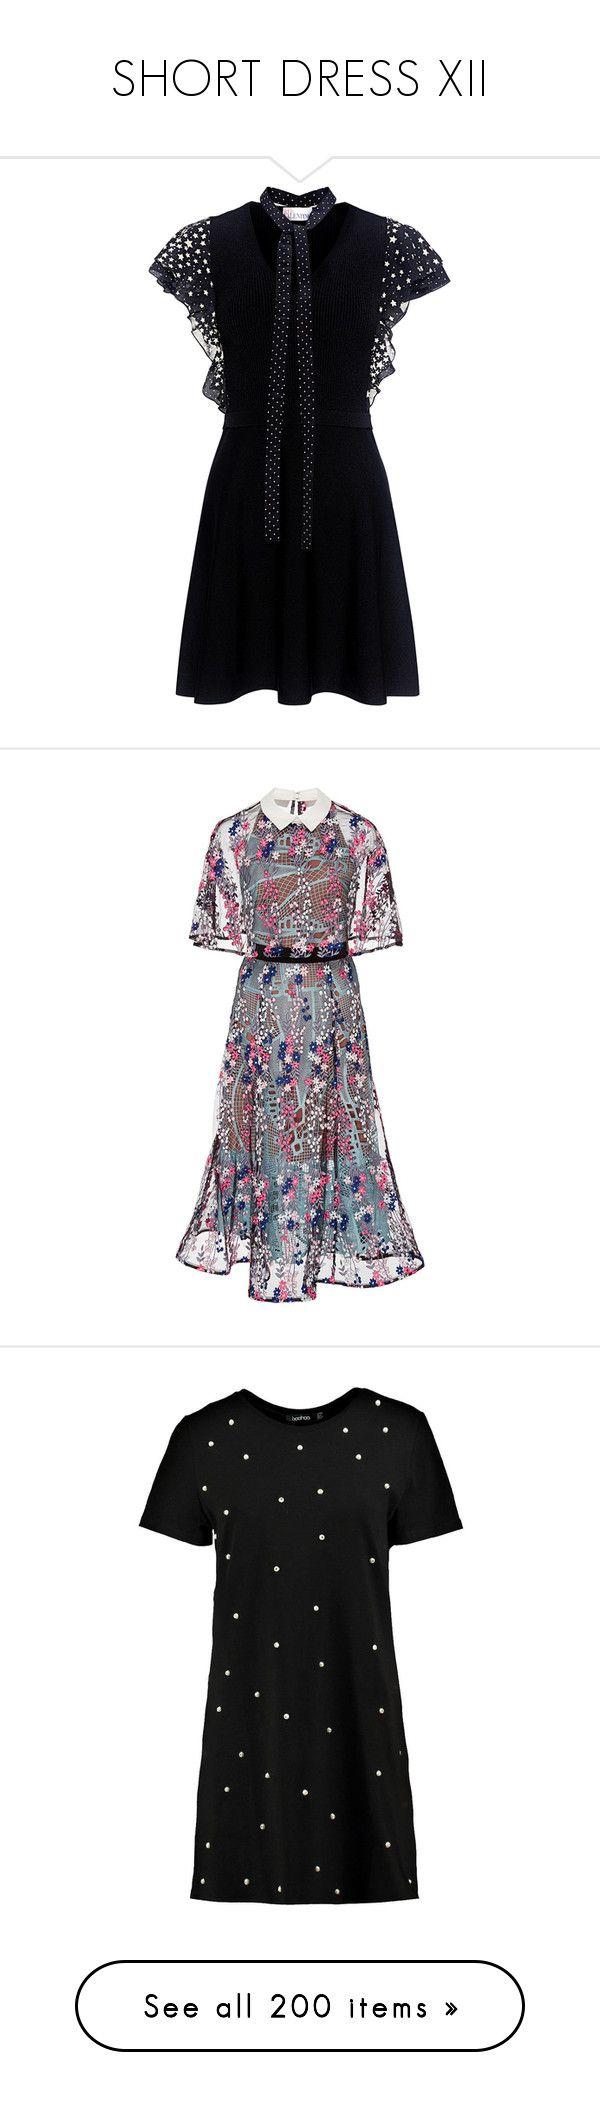 """SHORT DRESS XII"" by saska2000 ❤ liked on Polyvore featuring dresses, star dresses, slip on dress, ruffled-sleeve dresses, knit mini dress, fit flare dress, black, lace overlay dress, frill midi dress and tiered midi dress"